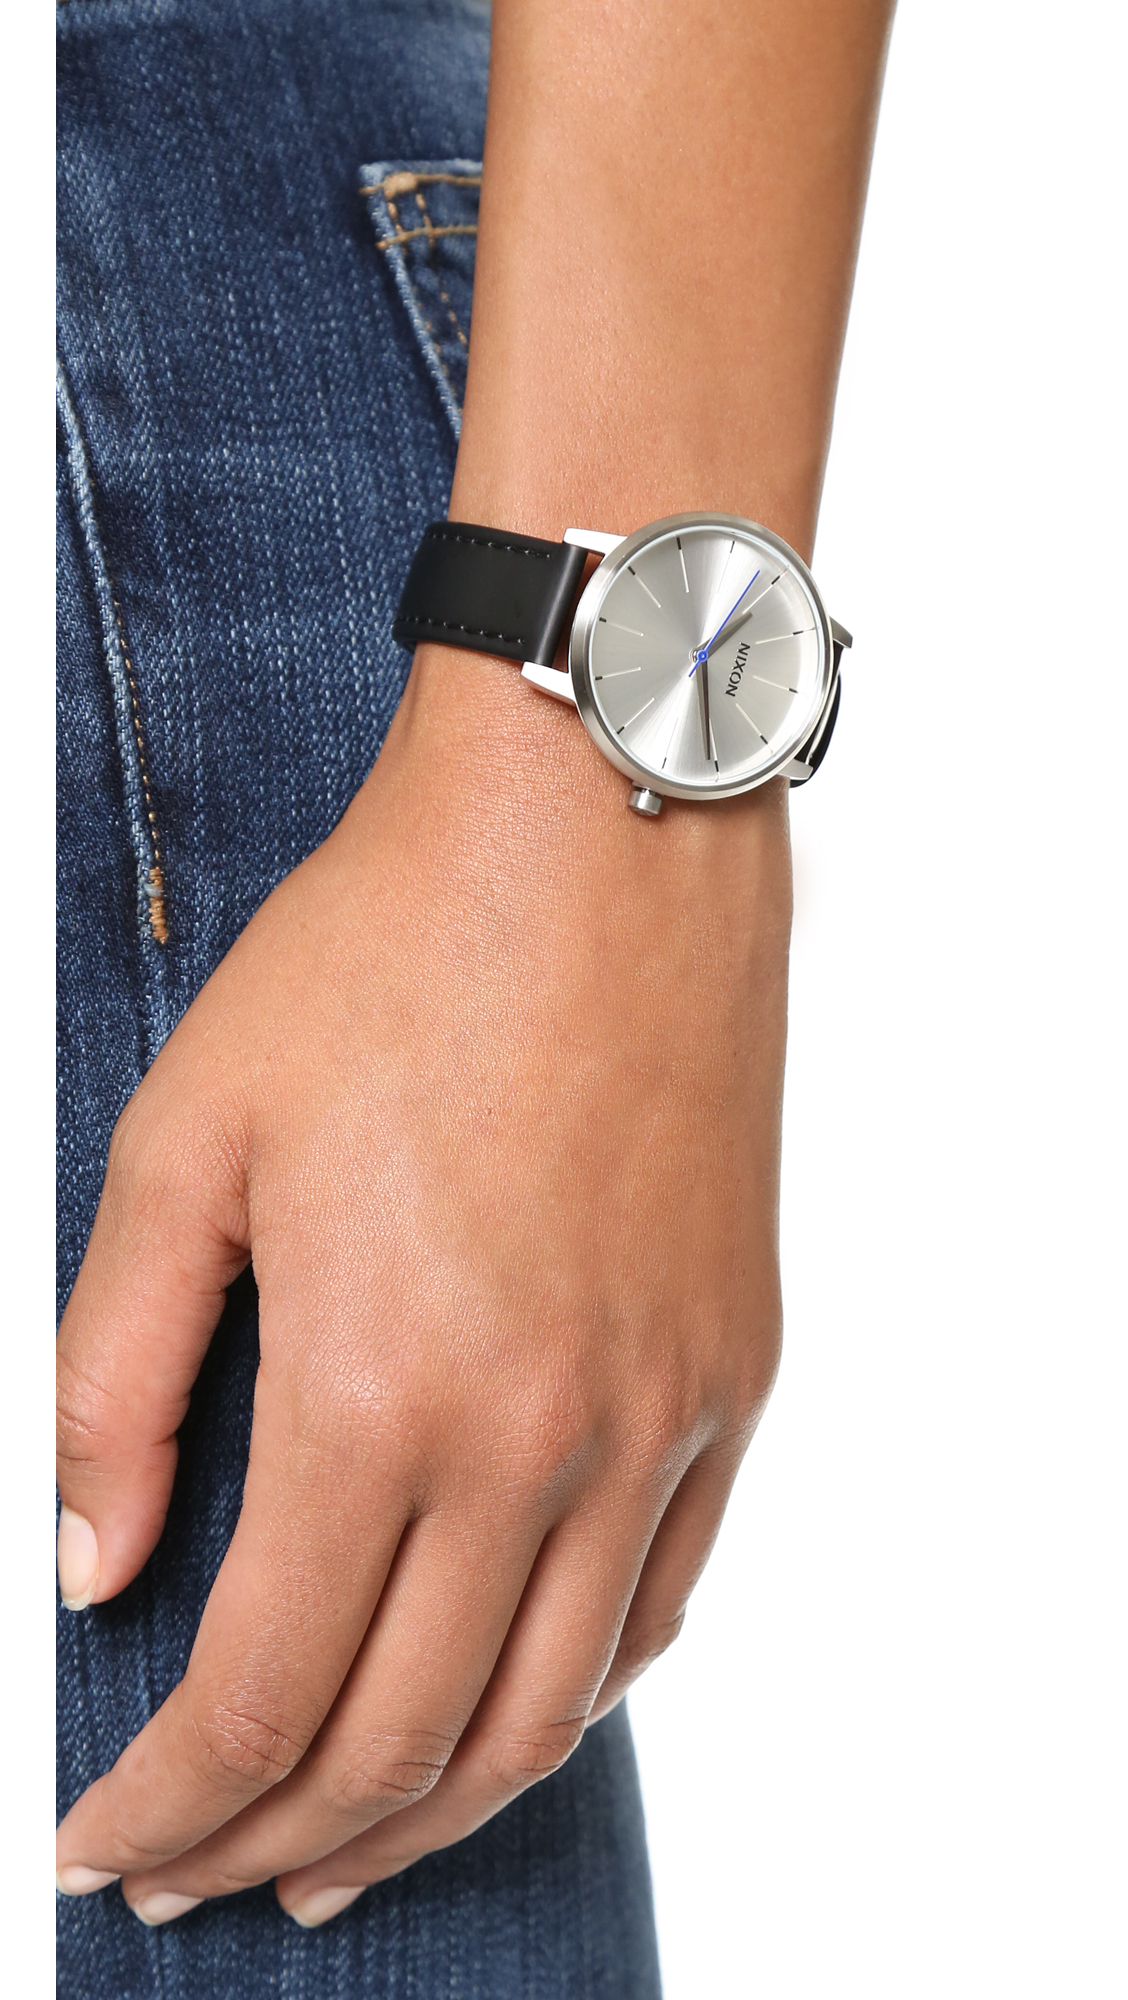 2783c923c Nixon Kensington Leather Watch in Metallic - Lyst